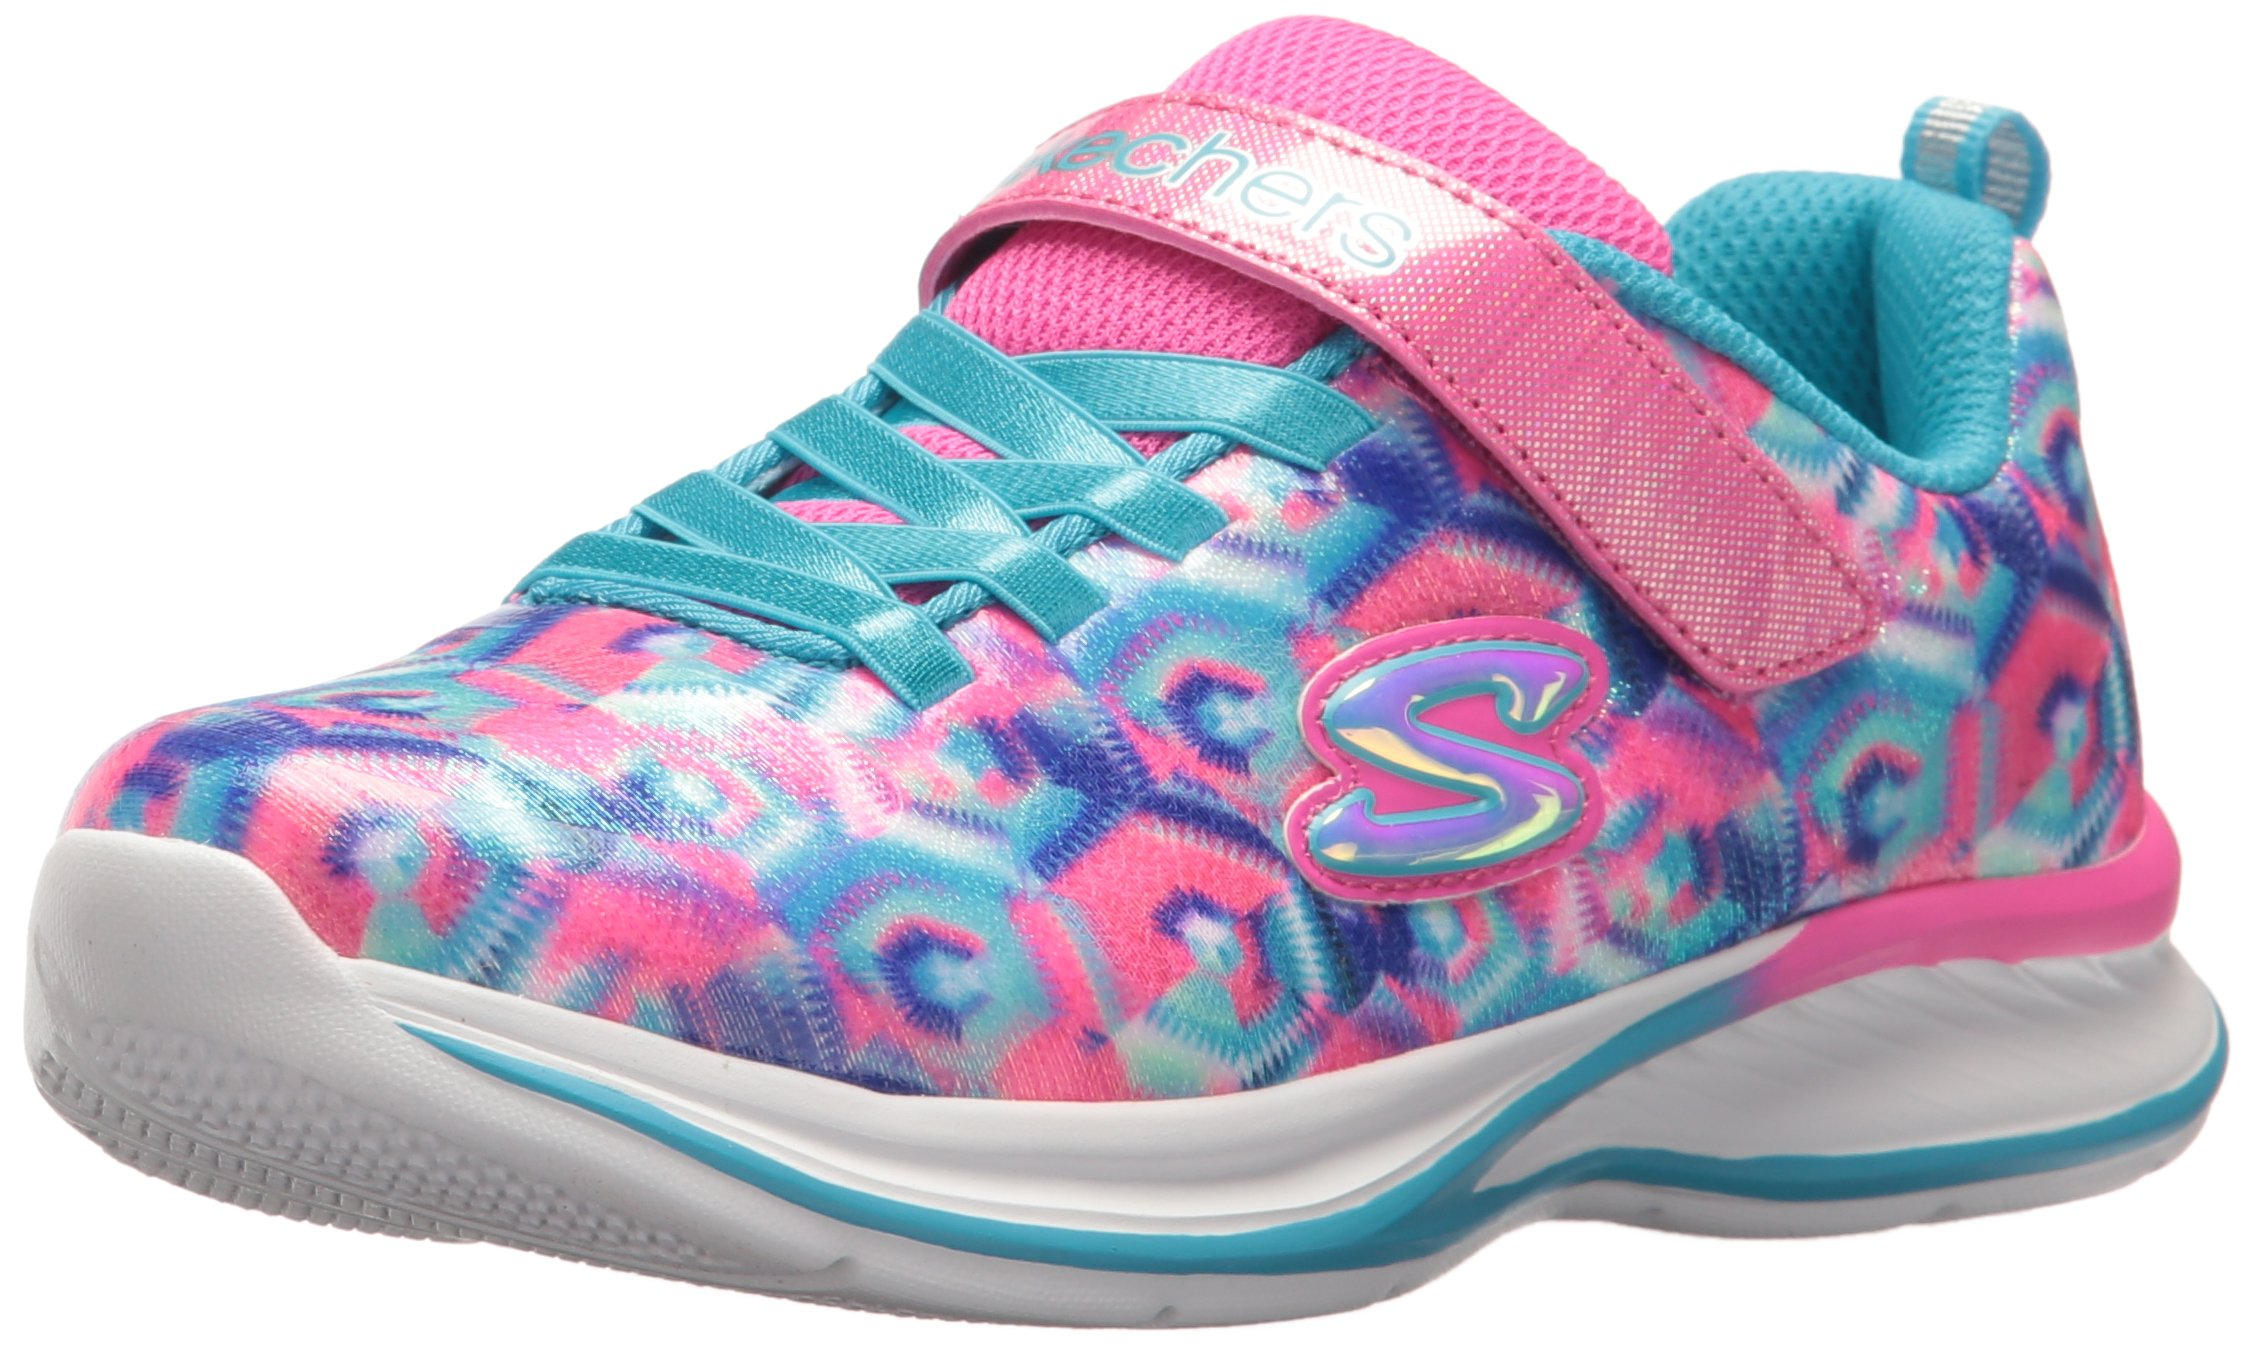 Skechers Kids' Jumpin' Jams Sneaker